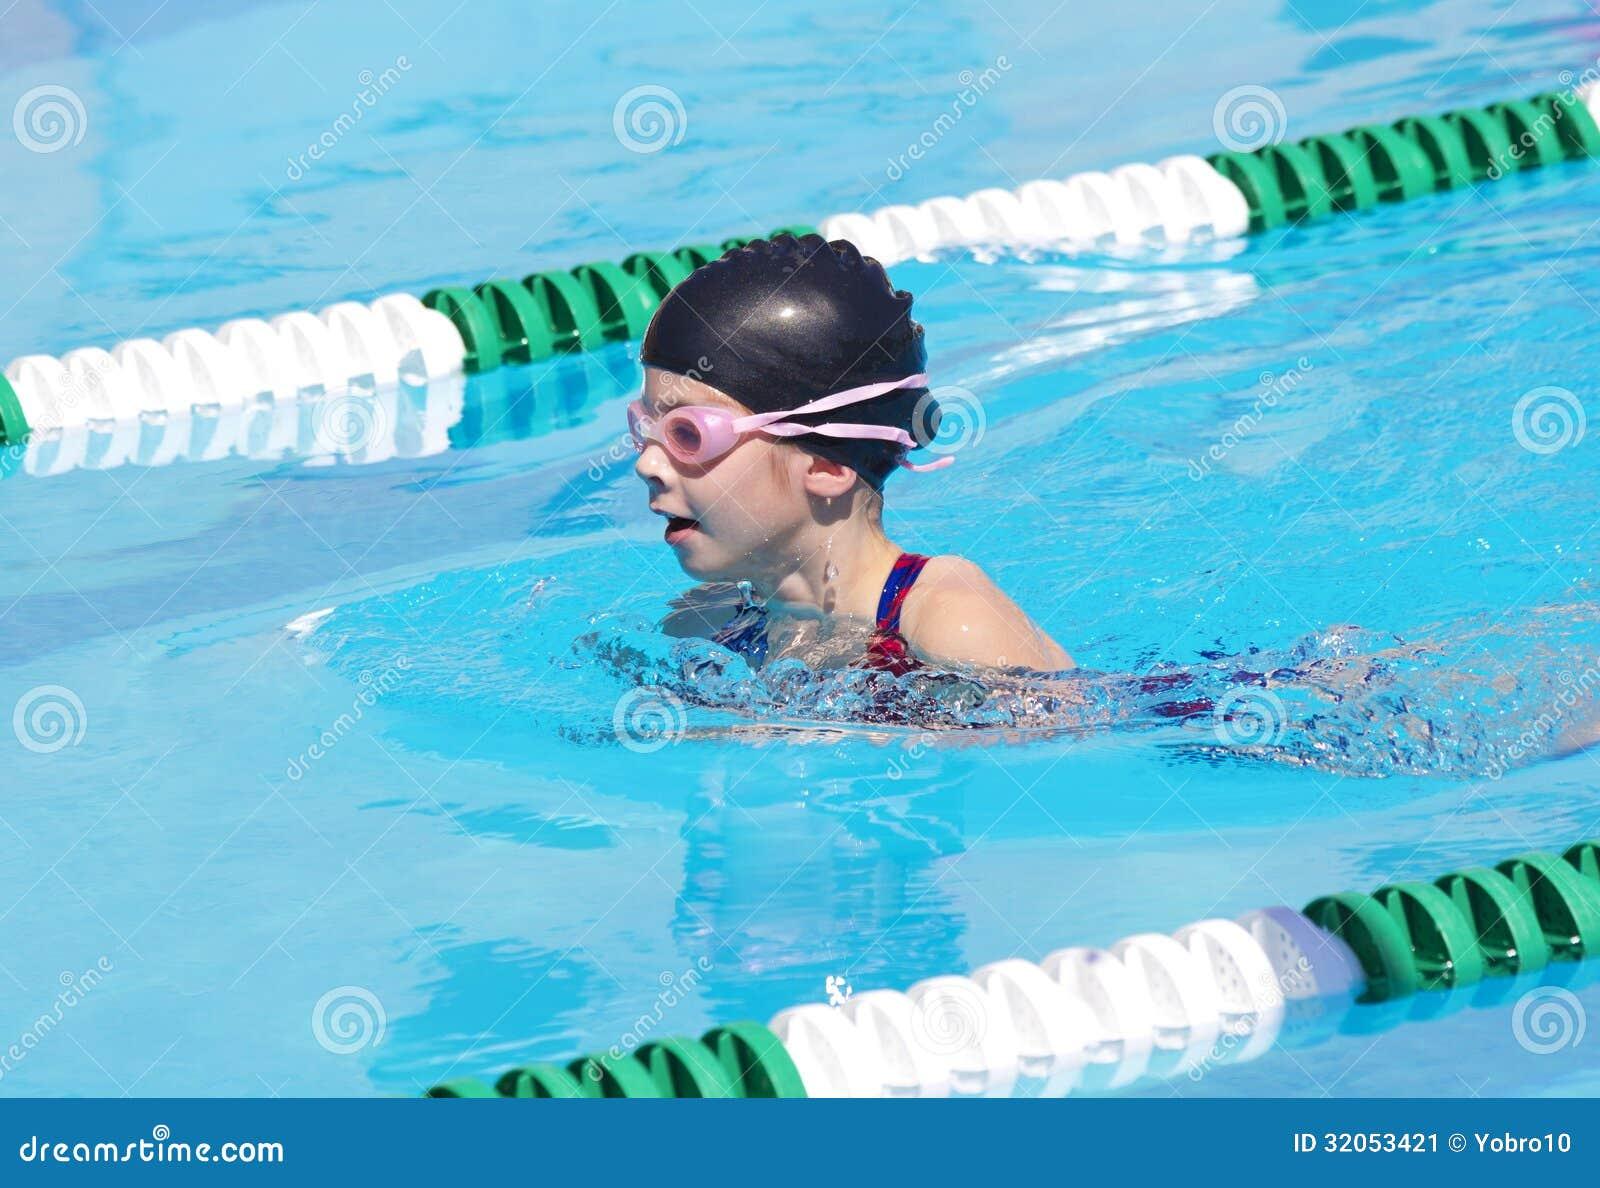 young swim images usseekcom